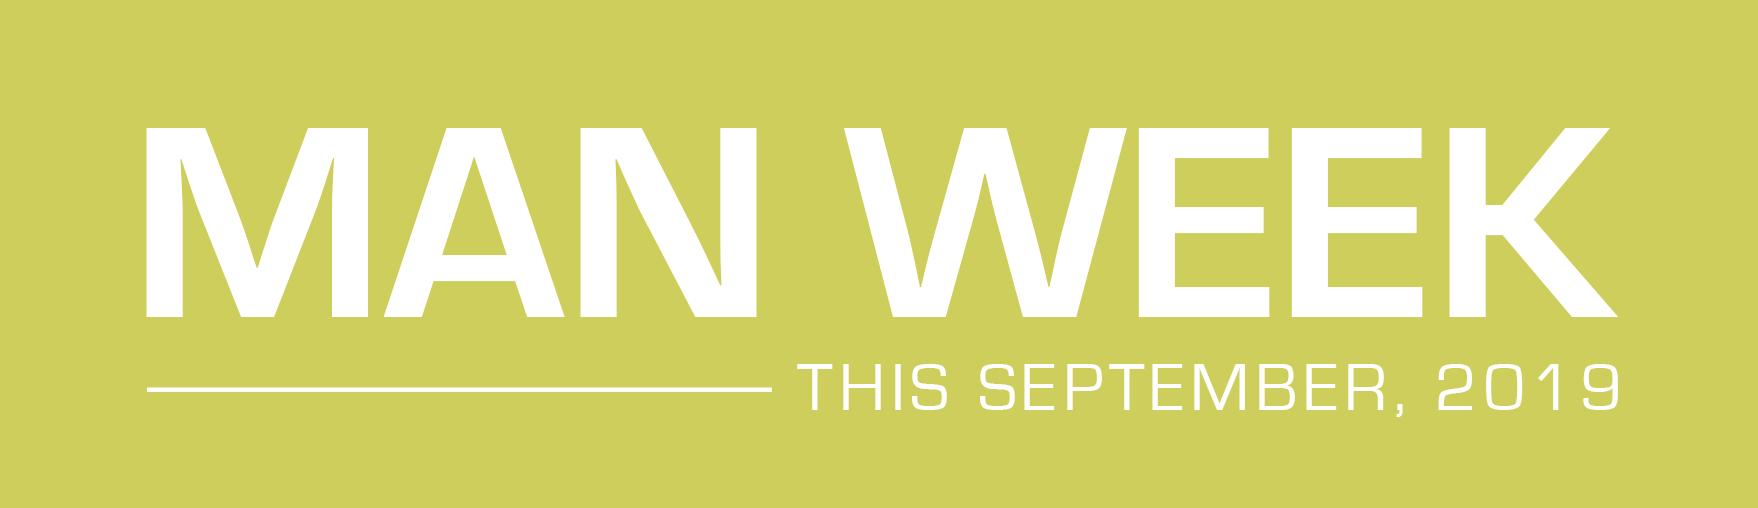 Man-Week-Title-2.png